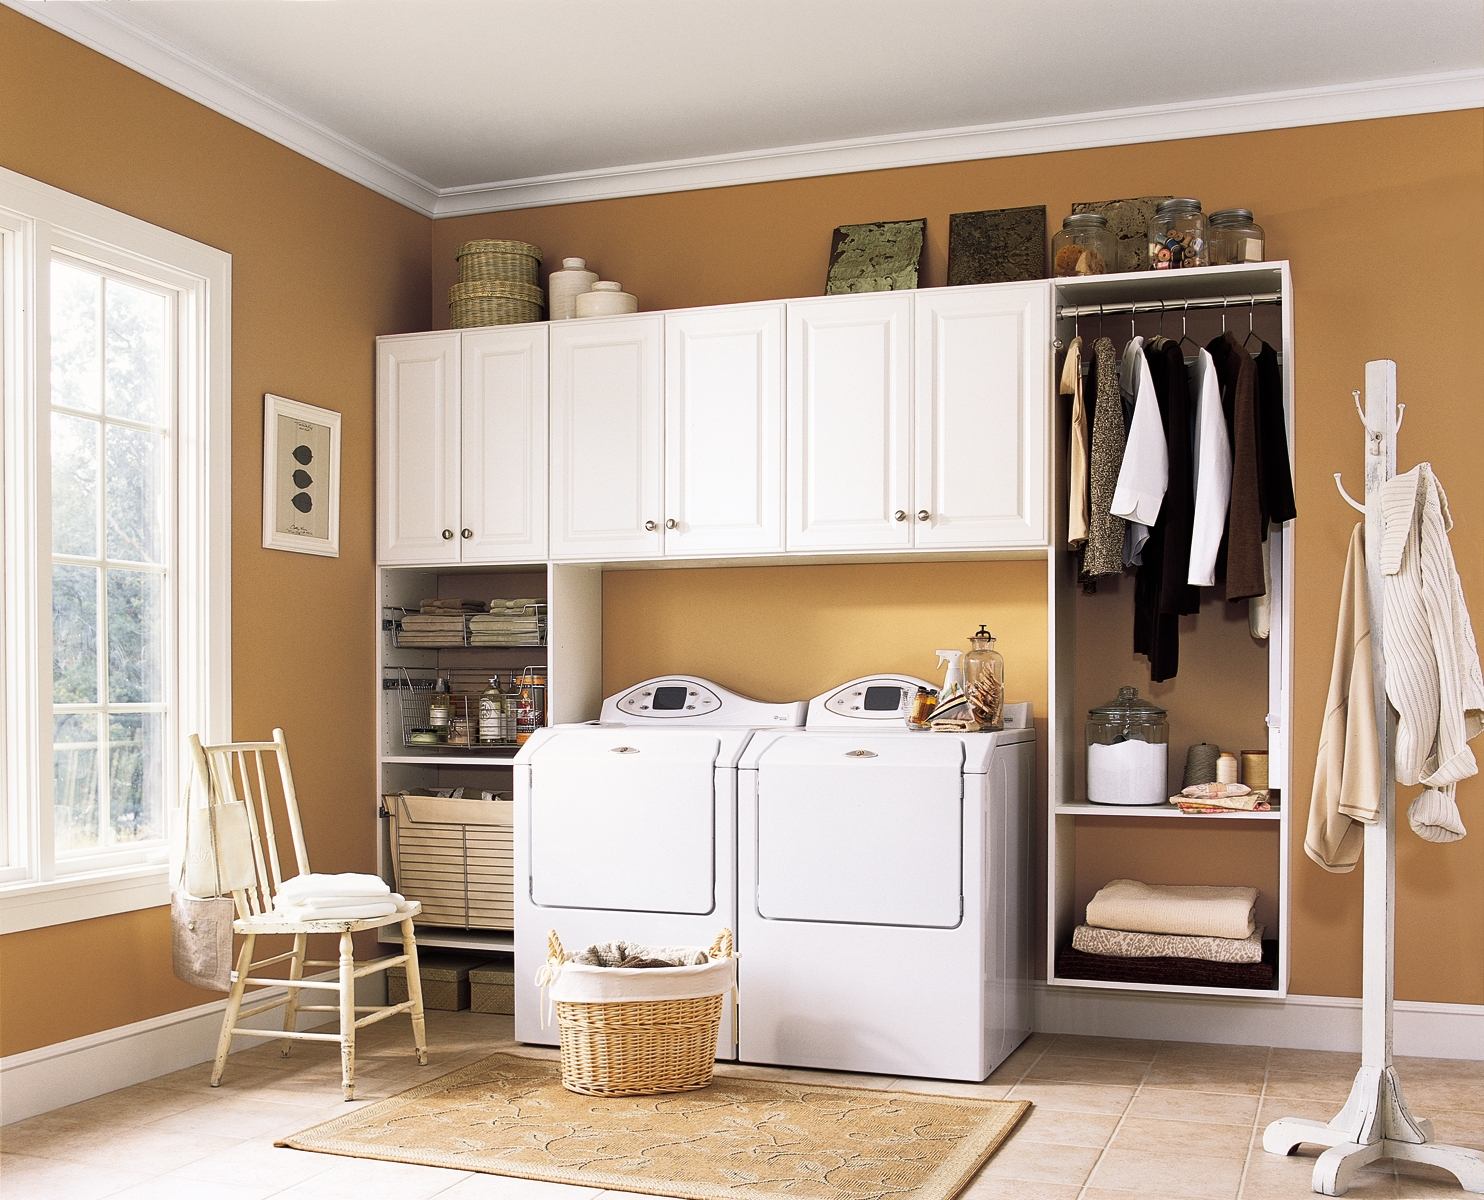 Laundry Room Storage, Organization and Inspiration on Laundry Room Organization Ideas  id=47453